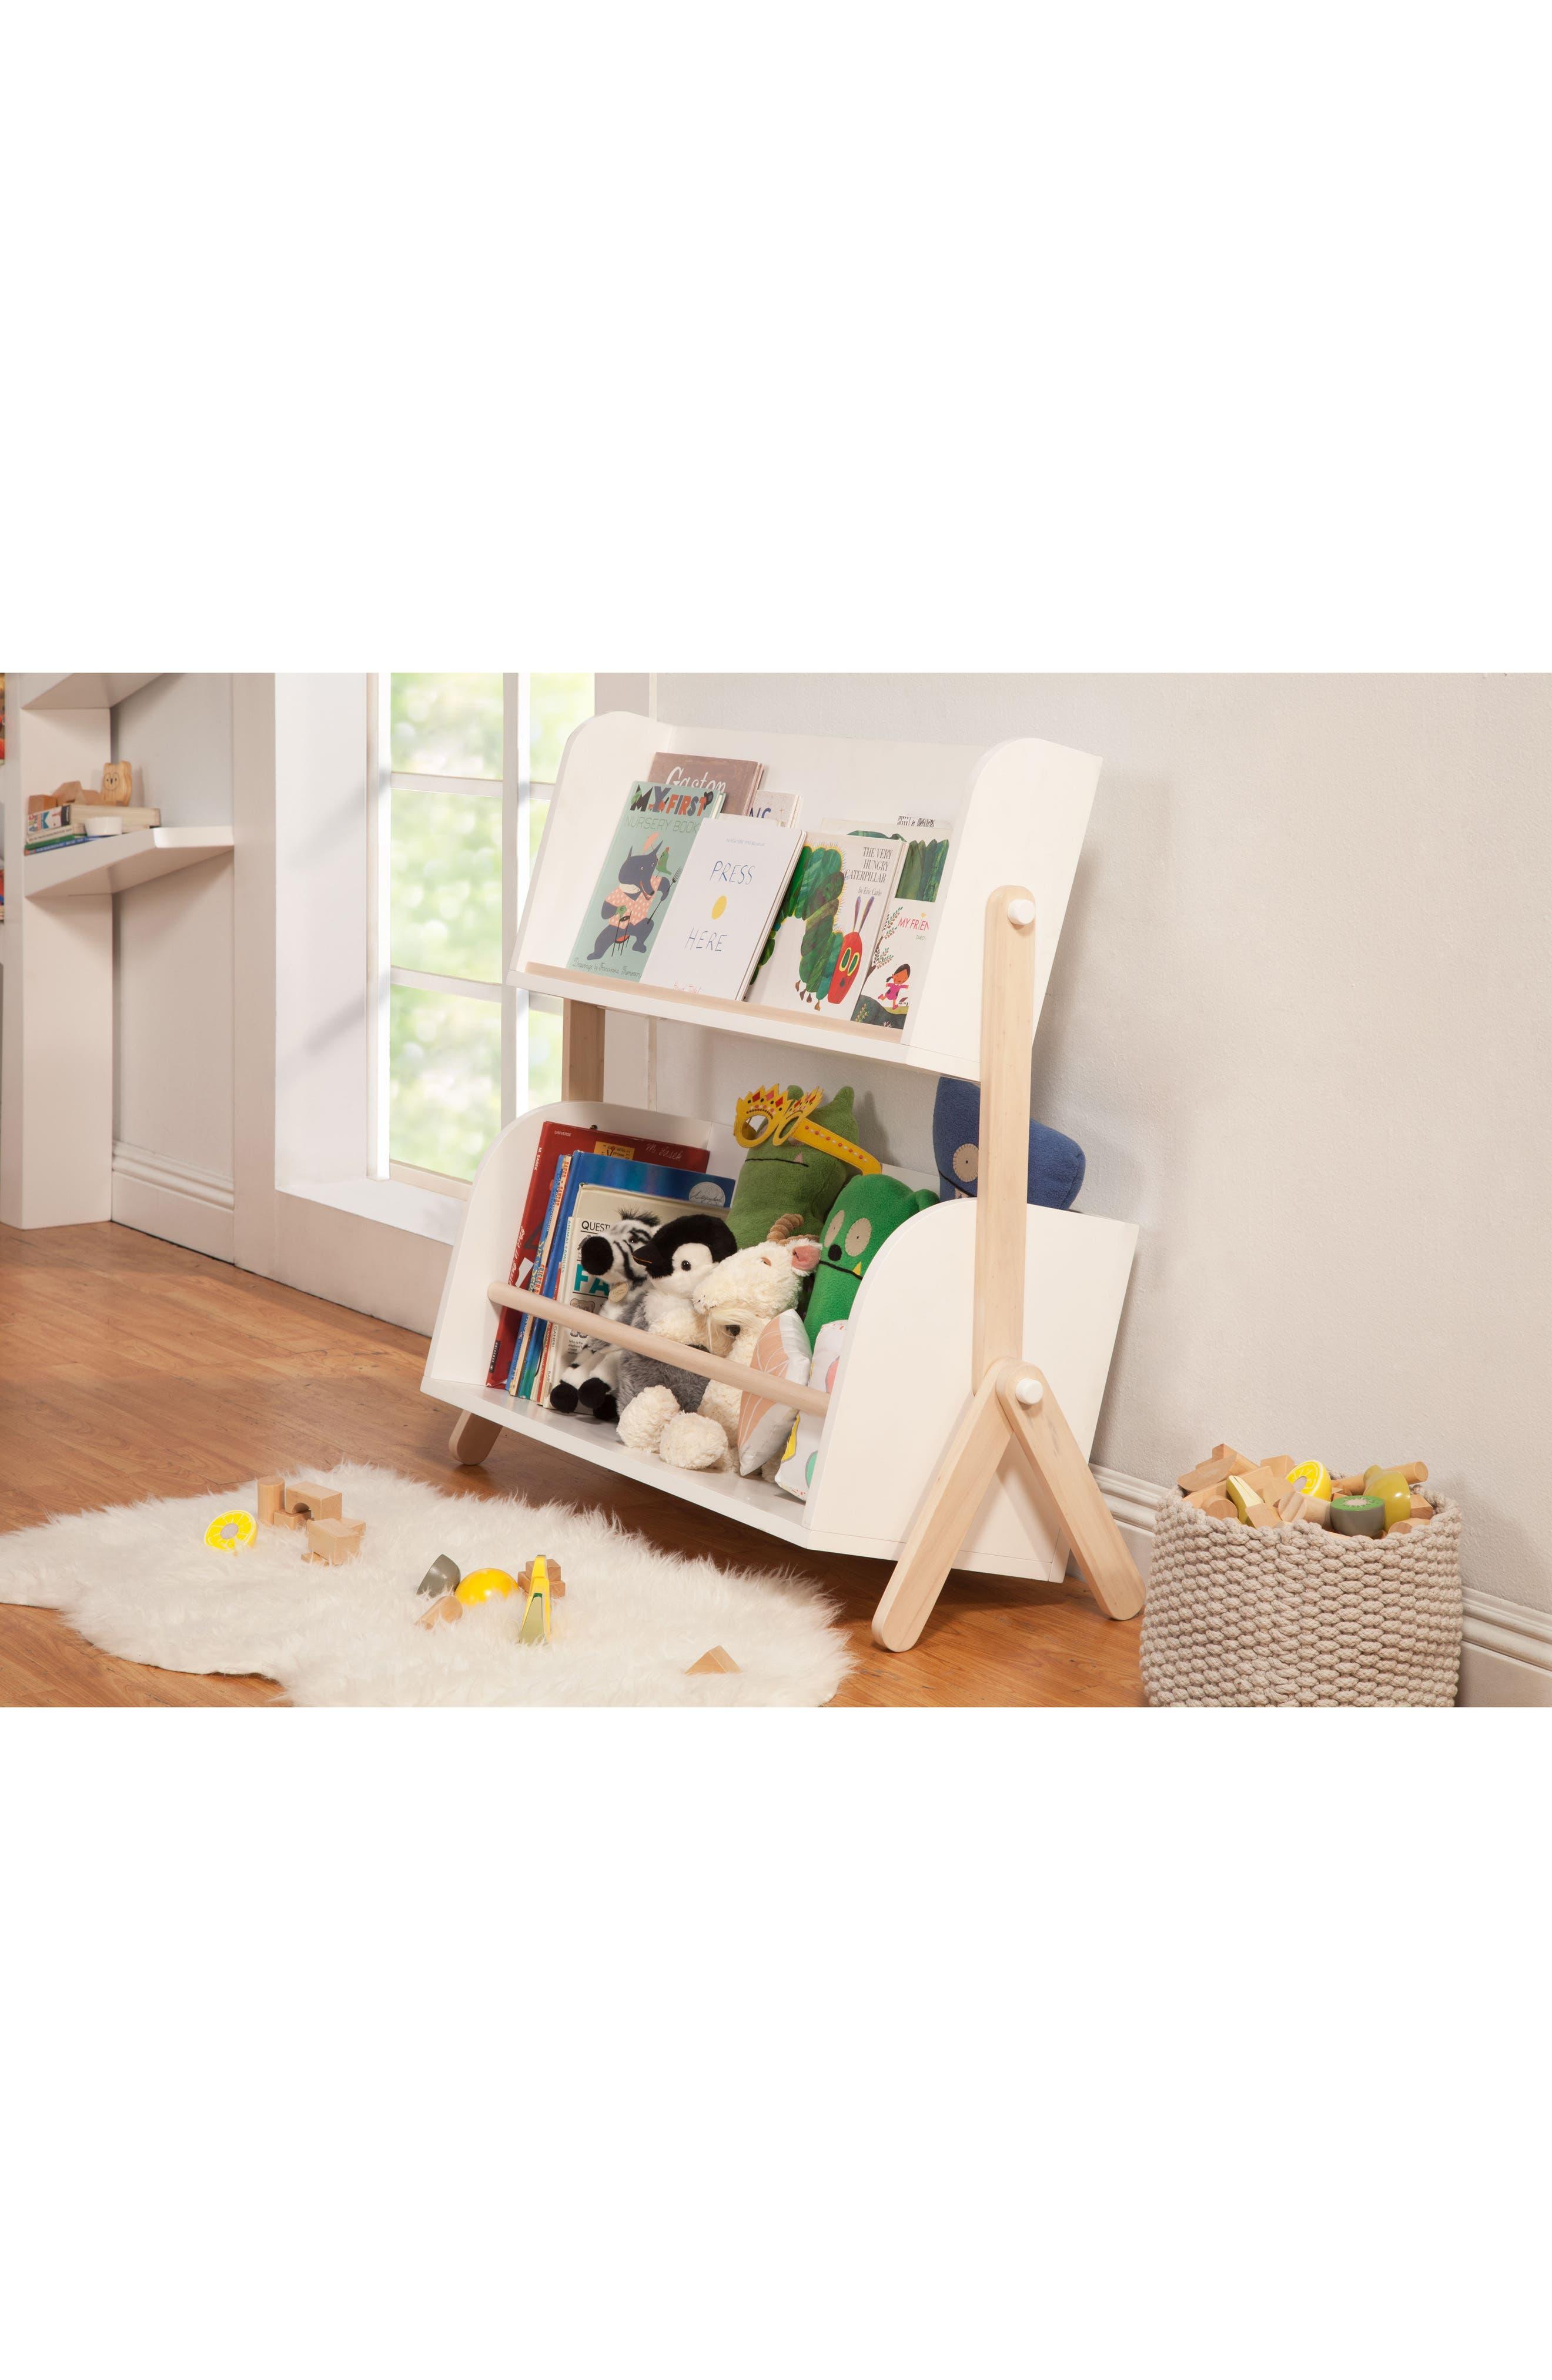 Tally Storage Bookshelf,                             Alternate thumbnail 4, color,                             WHITE/ NATURAL